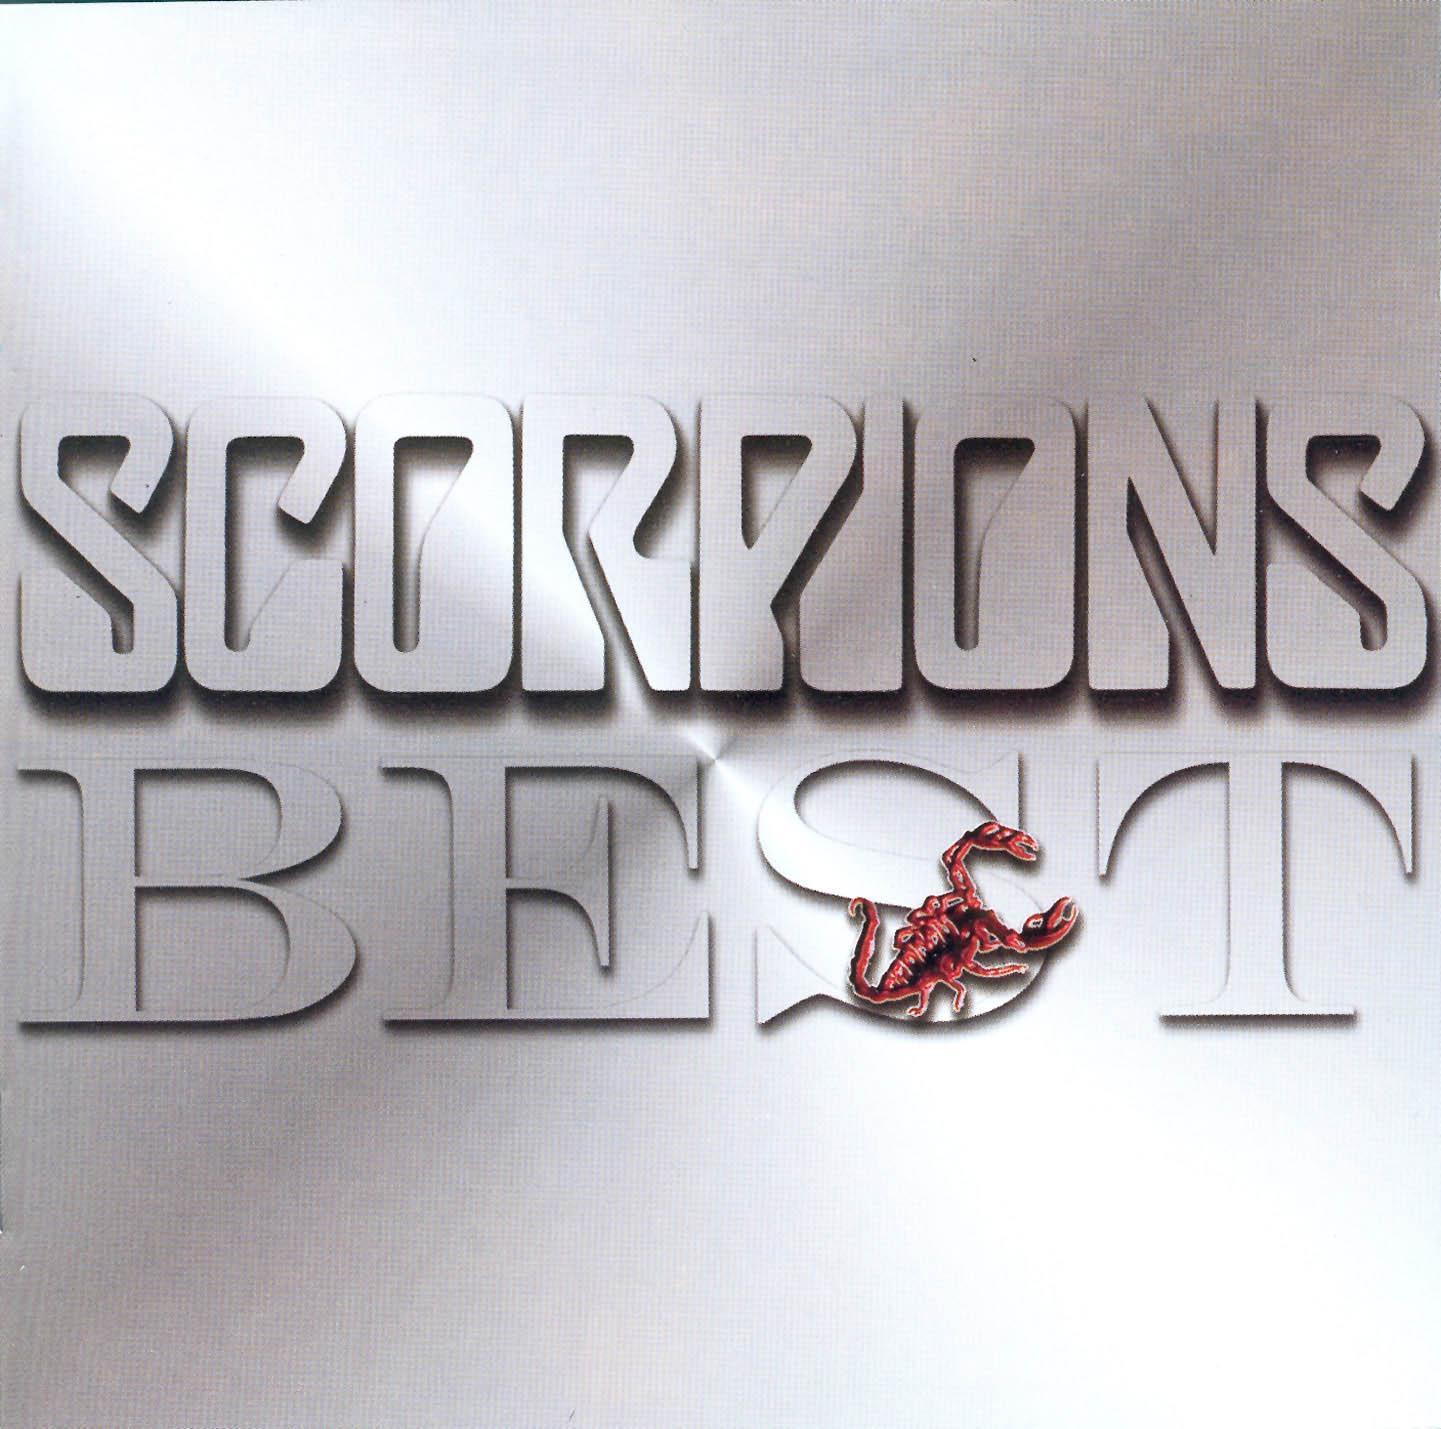 Scorpions best